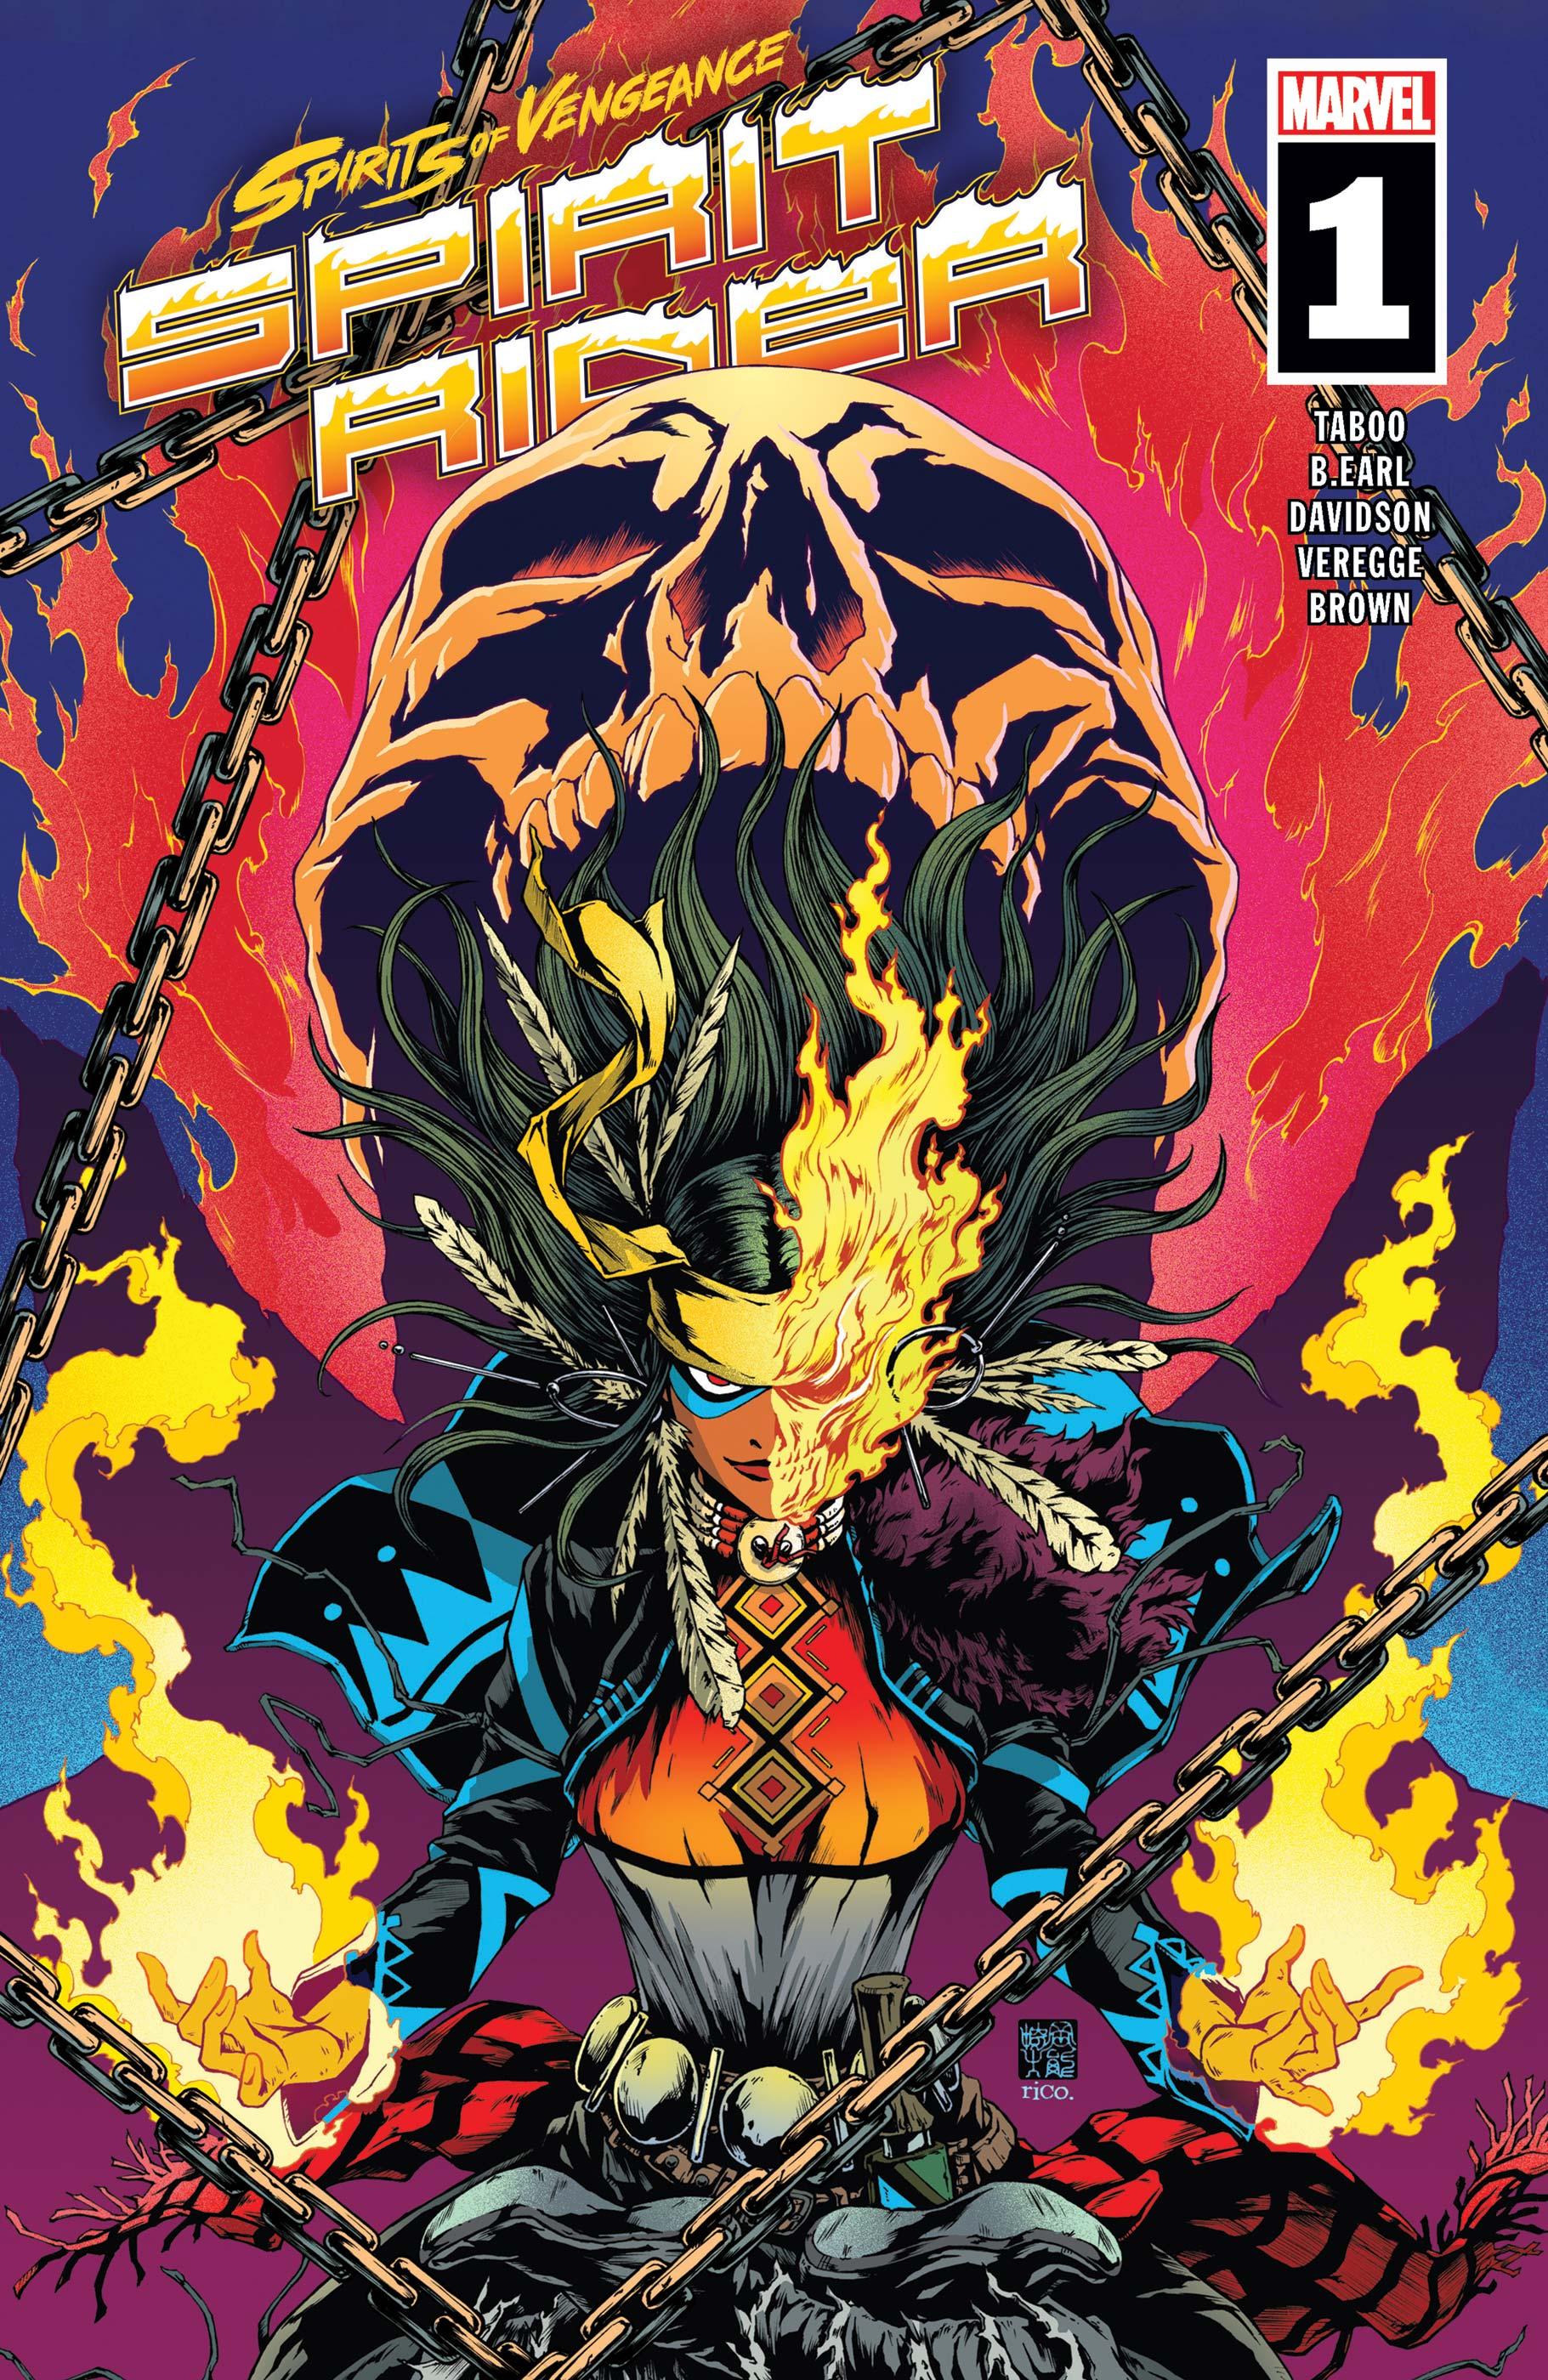 Spirits of Vengeance: Spirit Rider (2021) #1